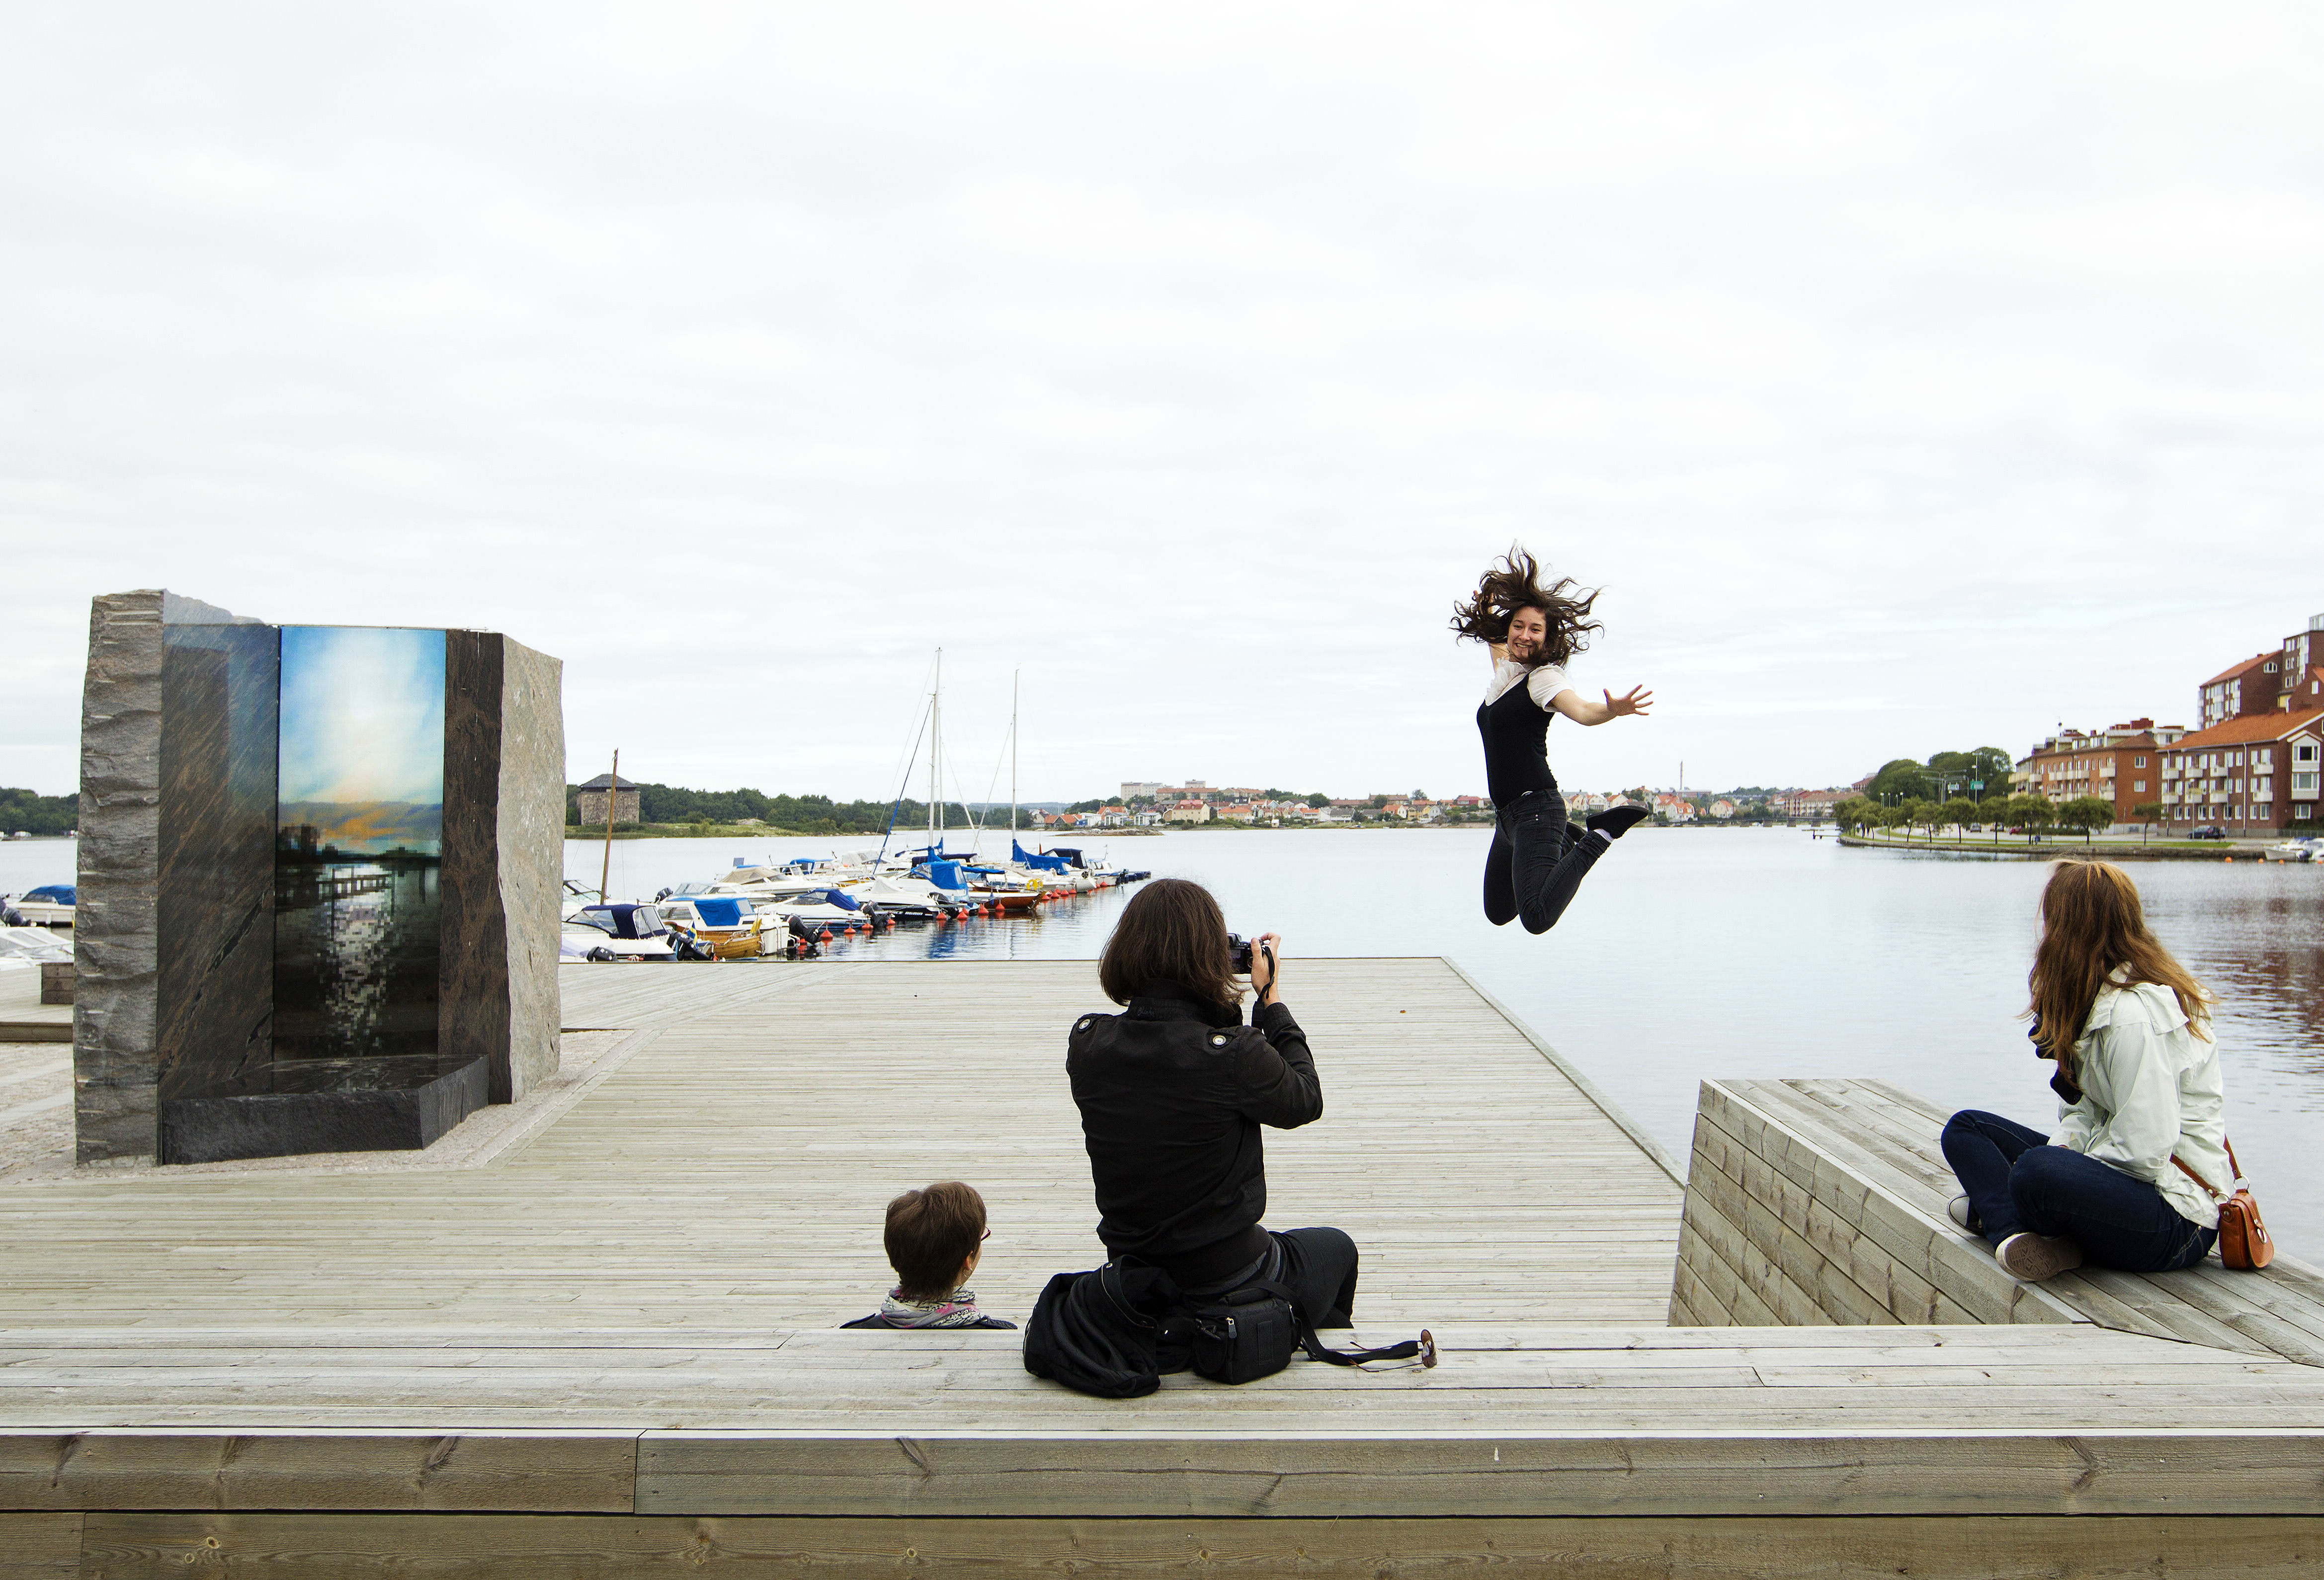 Thorbjorn_FisktorgetPlaza, Karlskrona